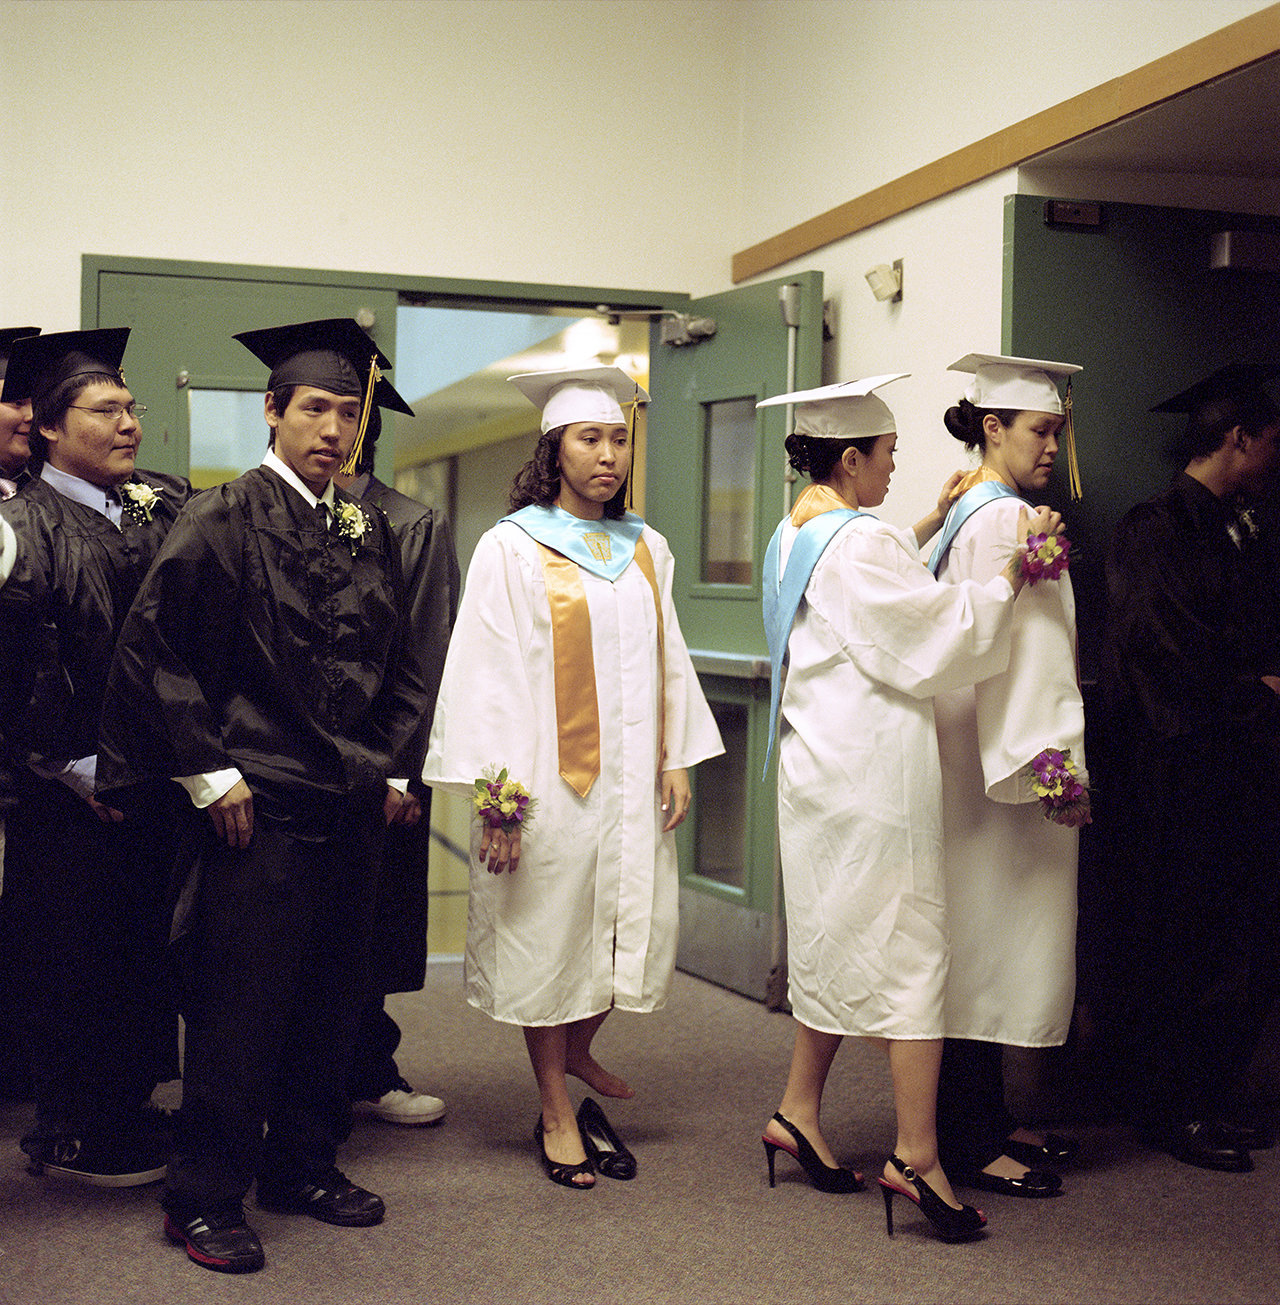 Michael, Ricky, Heather, Caroline and Abby, graduation class 2012